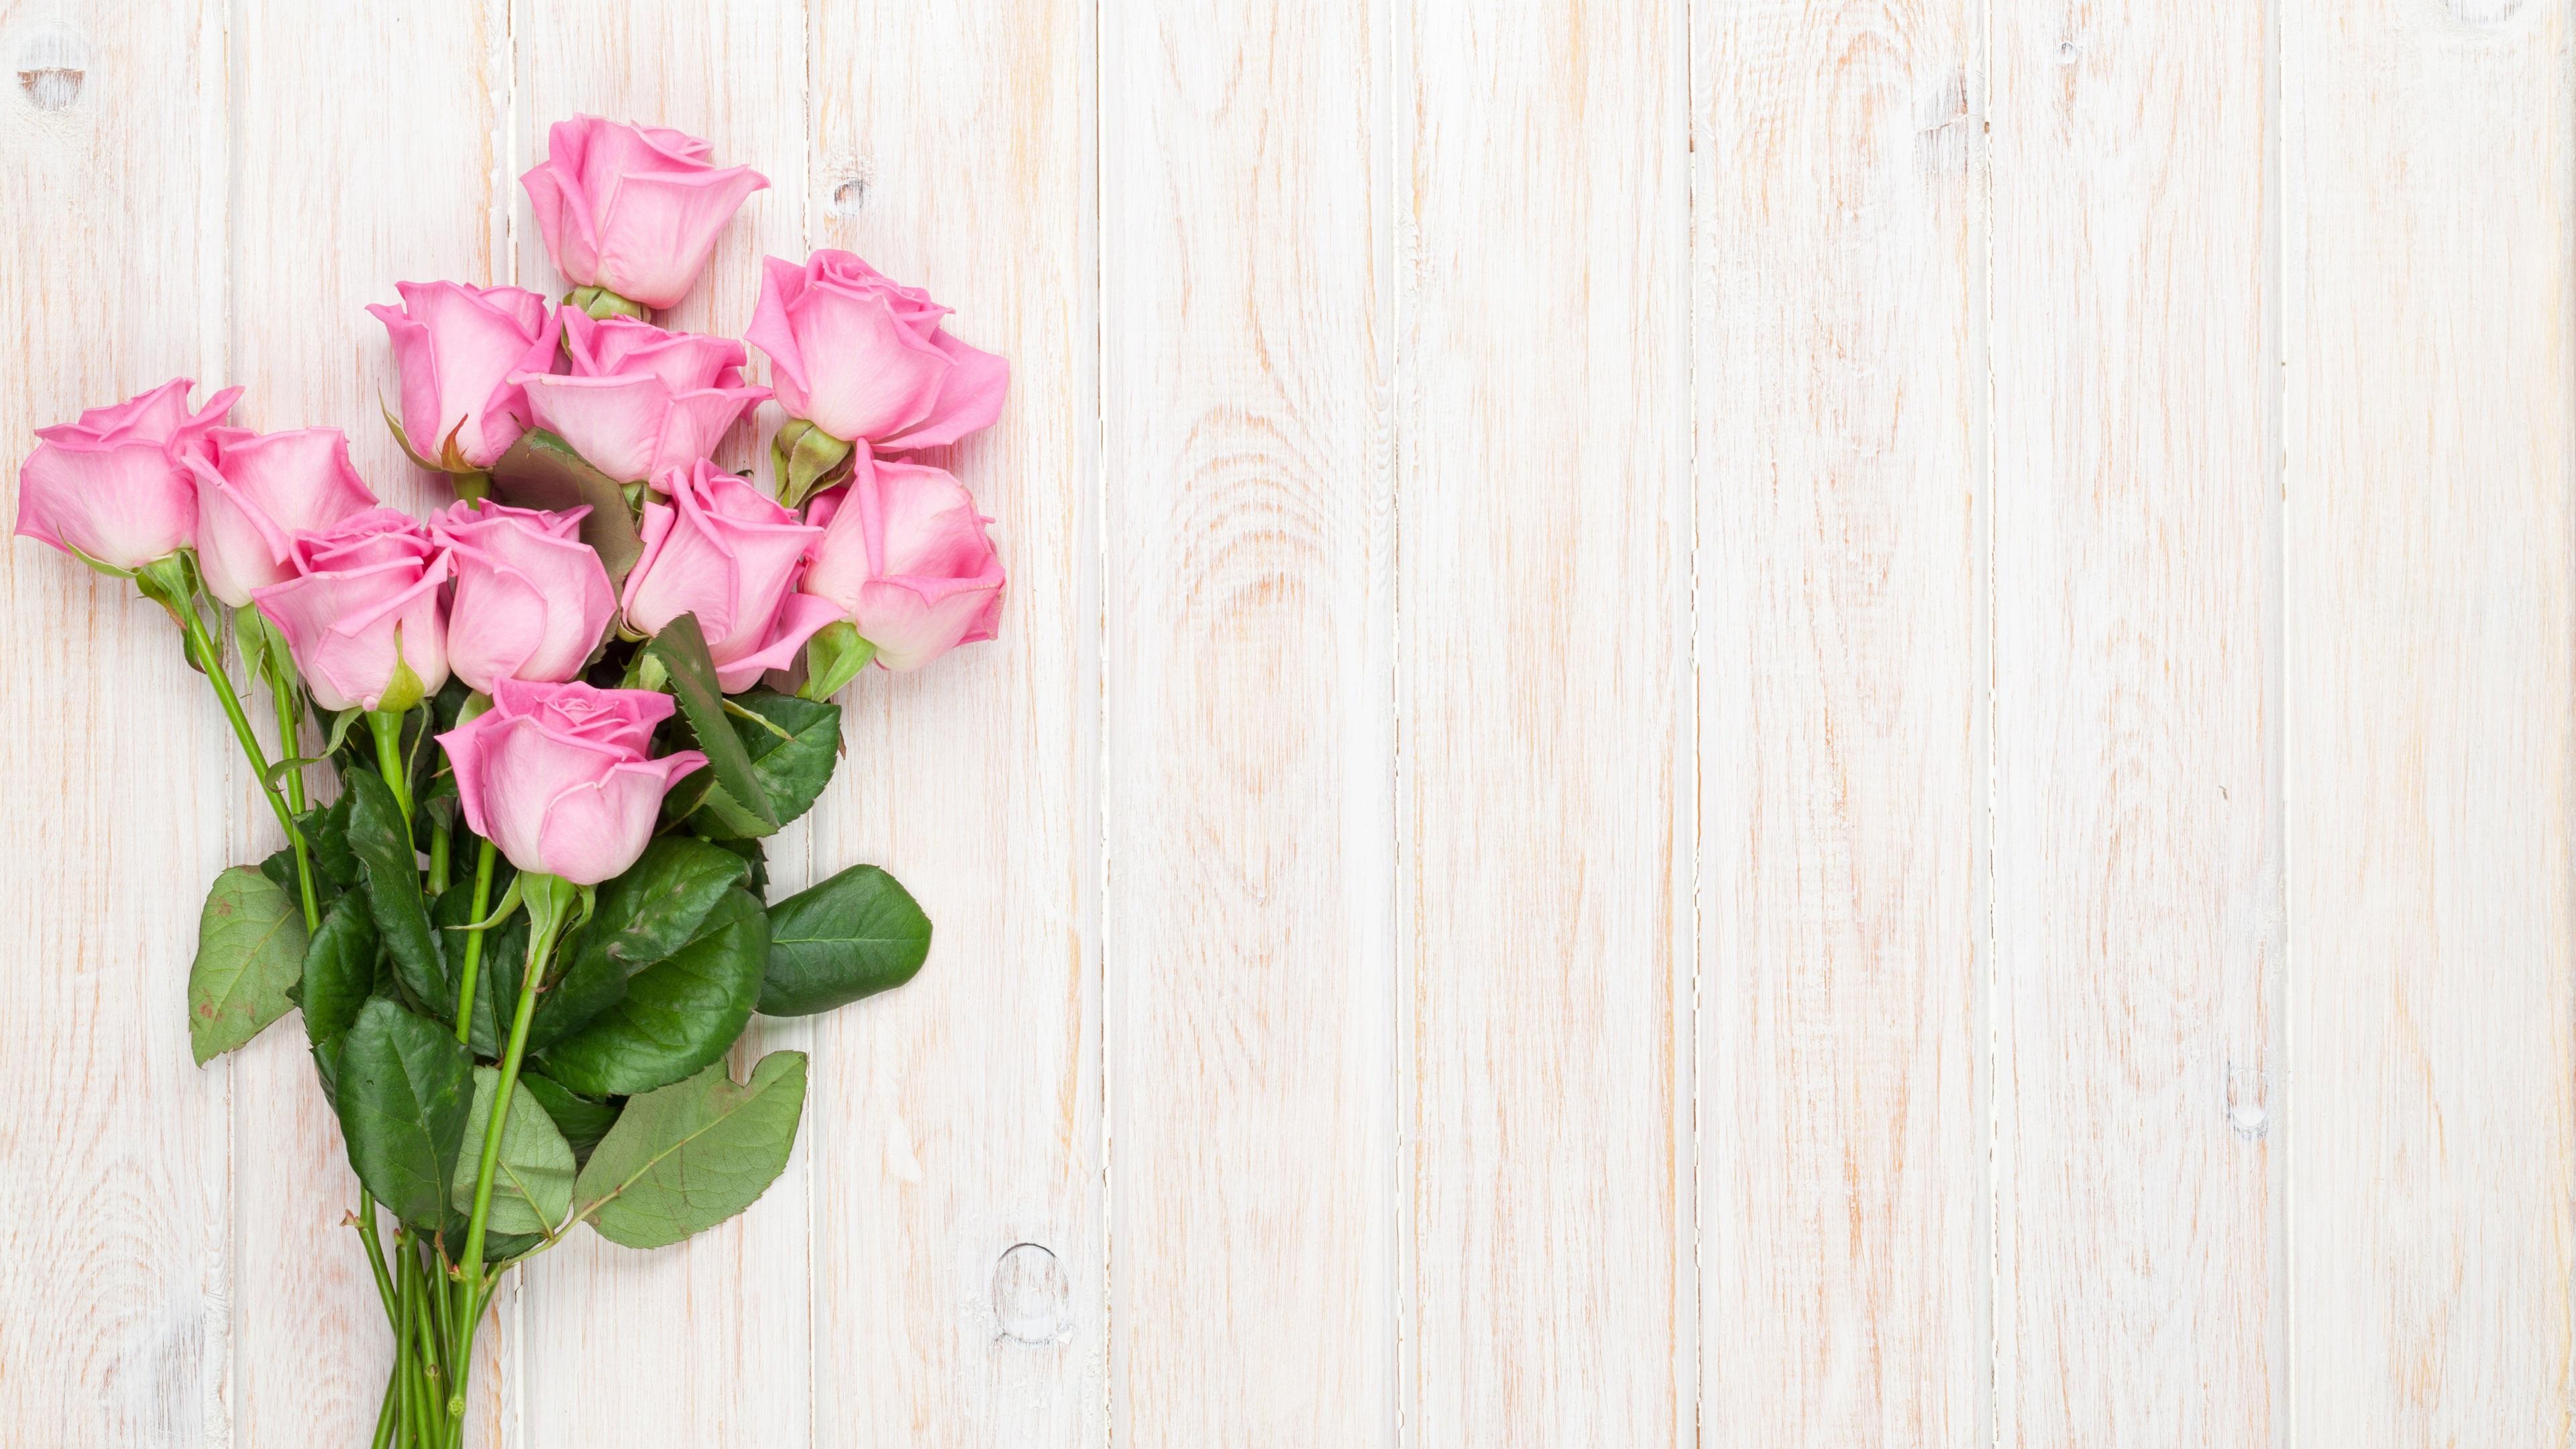 Fondos De Pantalla Ramo, Flores Rosadas, Rosas, Fondo De